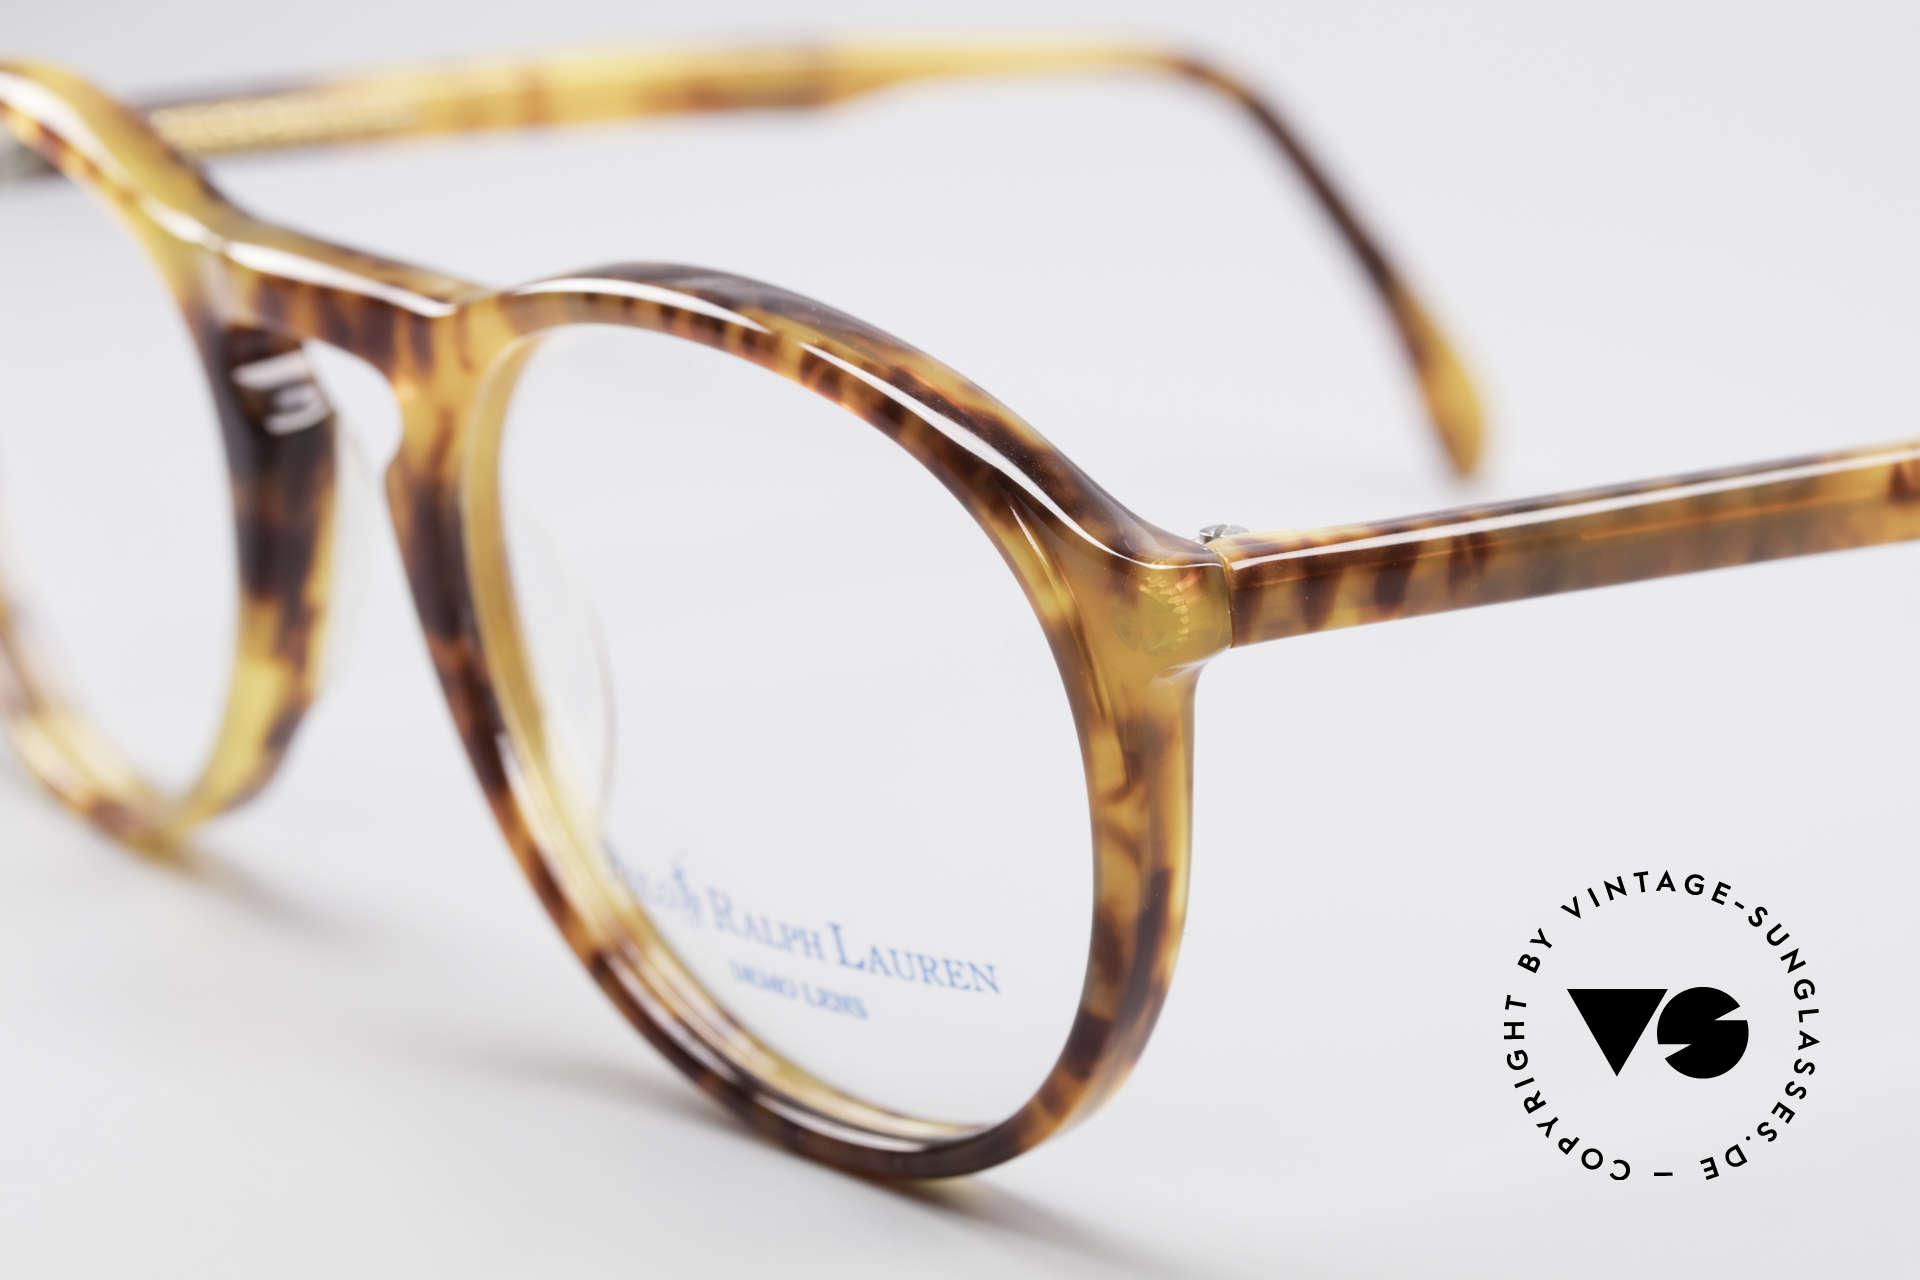 570386b70d58 Glasses Ralph Lauren 64 Men's Panto Eyeglasses | Vintage Sunglasses